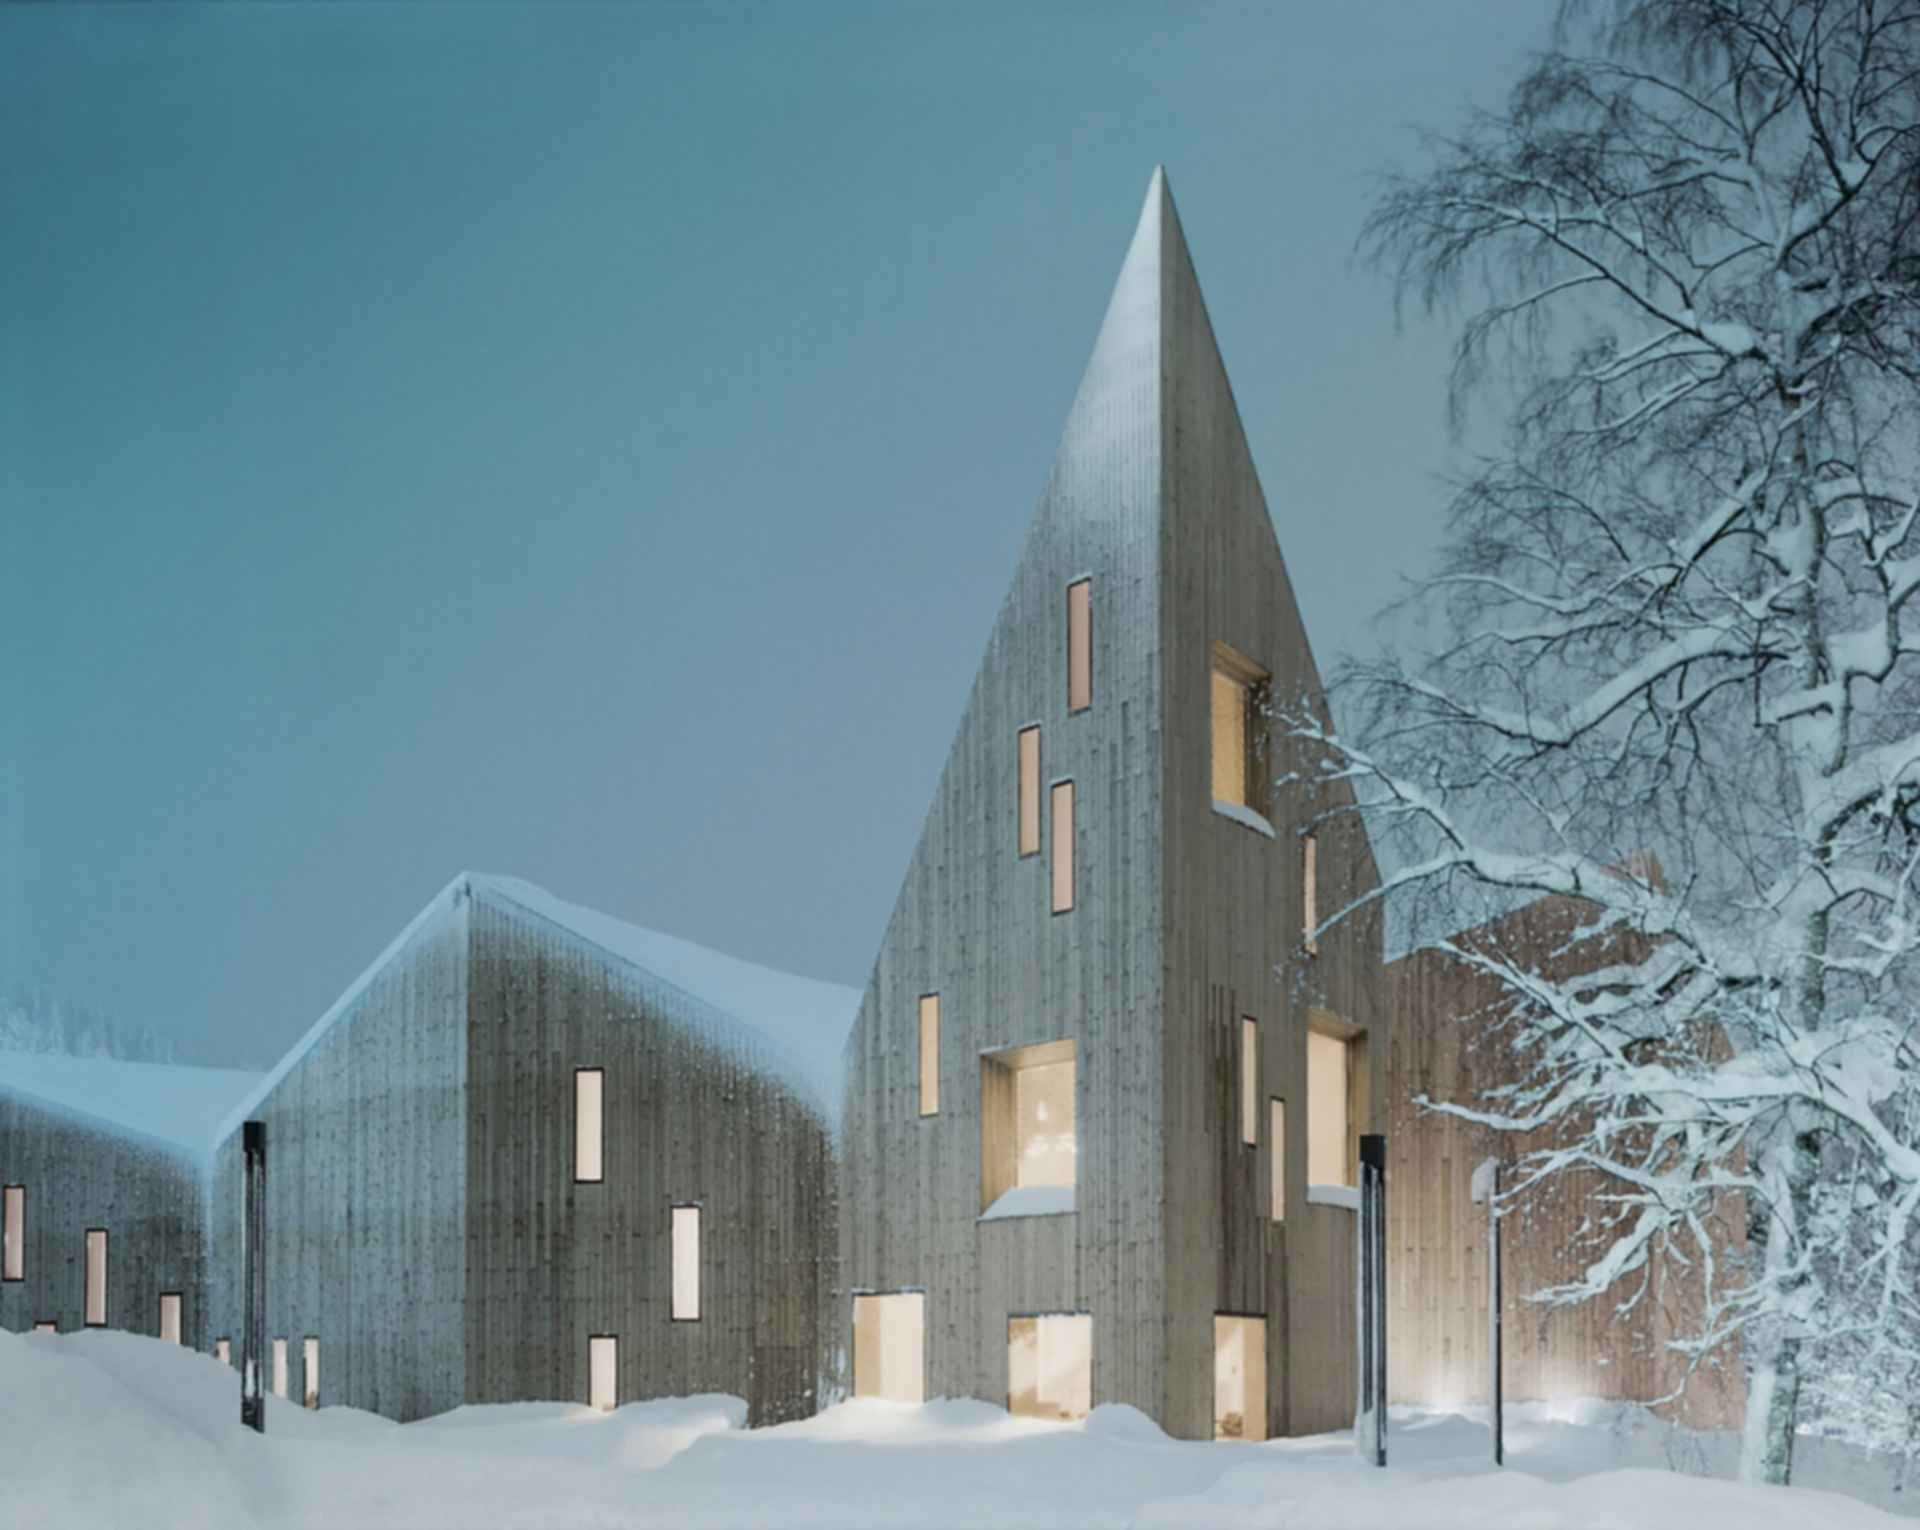 Romsdal Folk Museum - Concept Design/Exterior